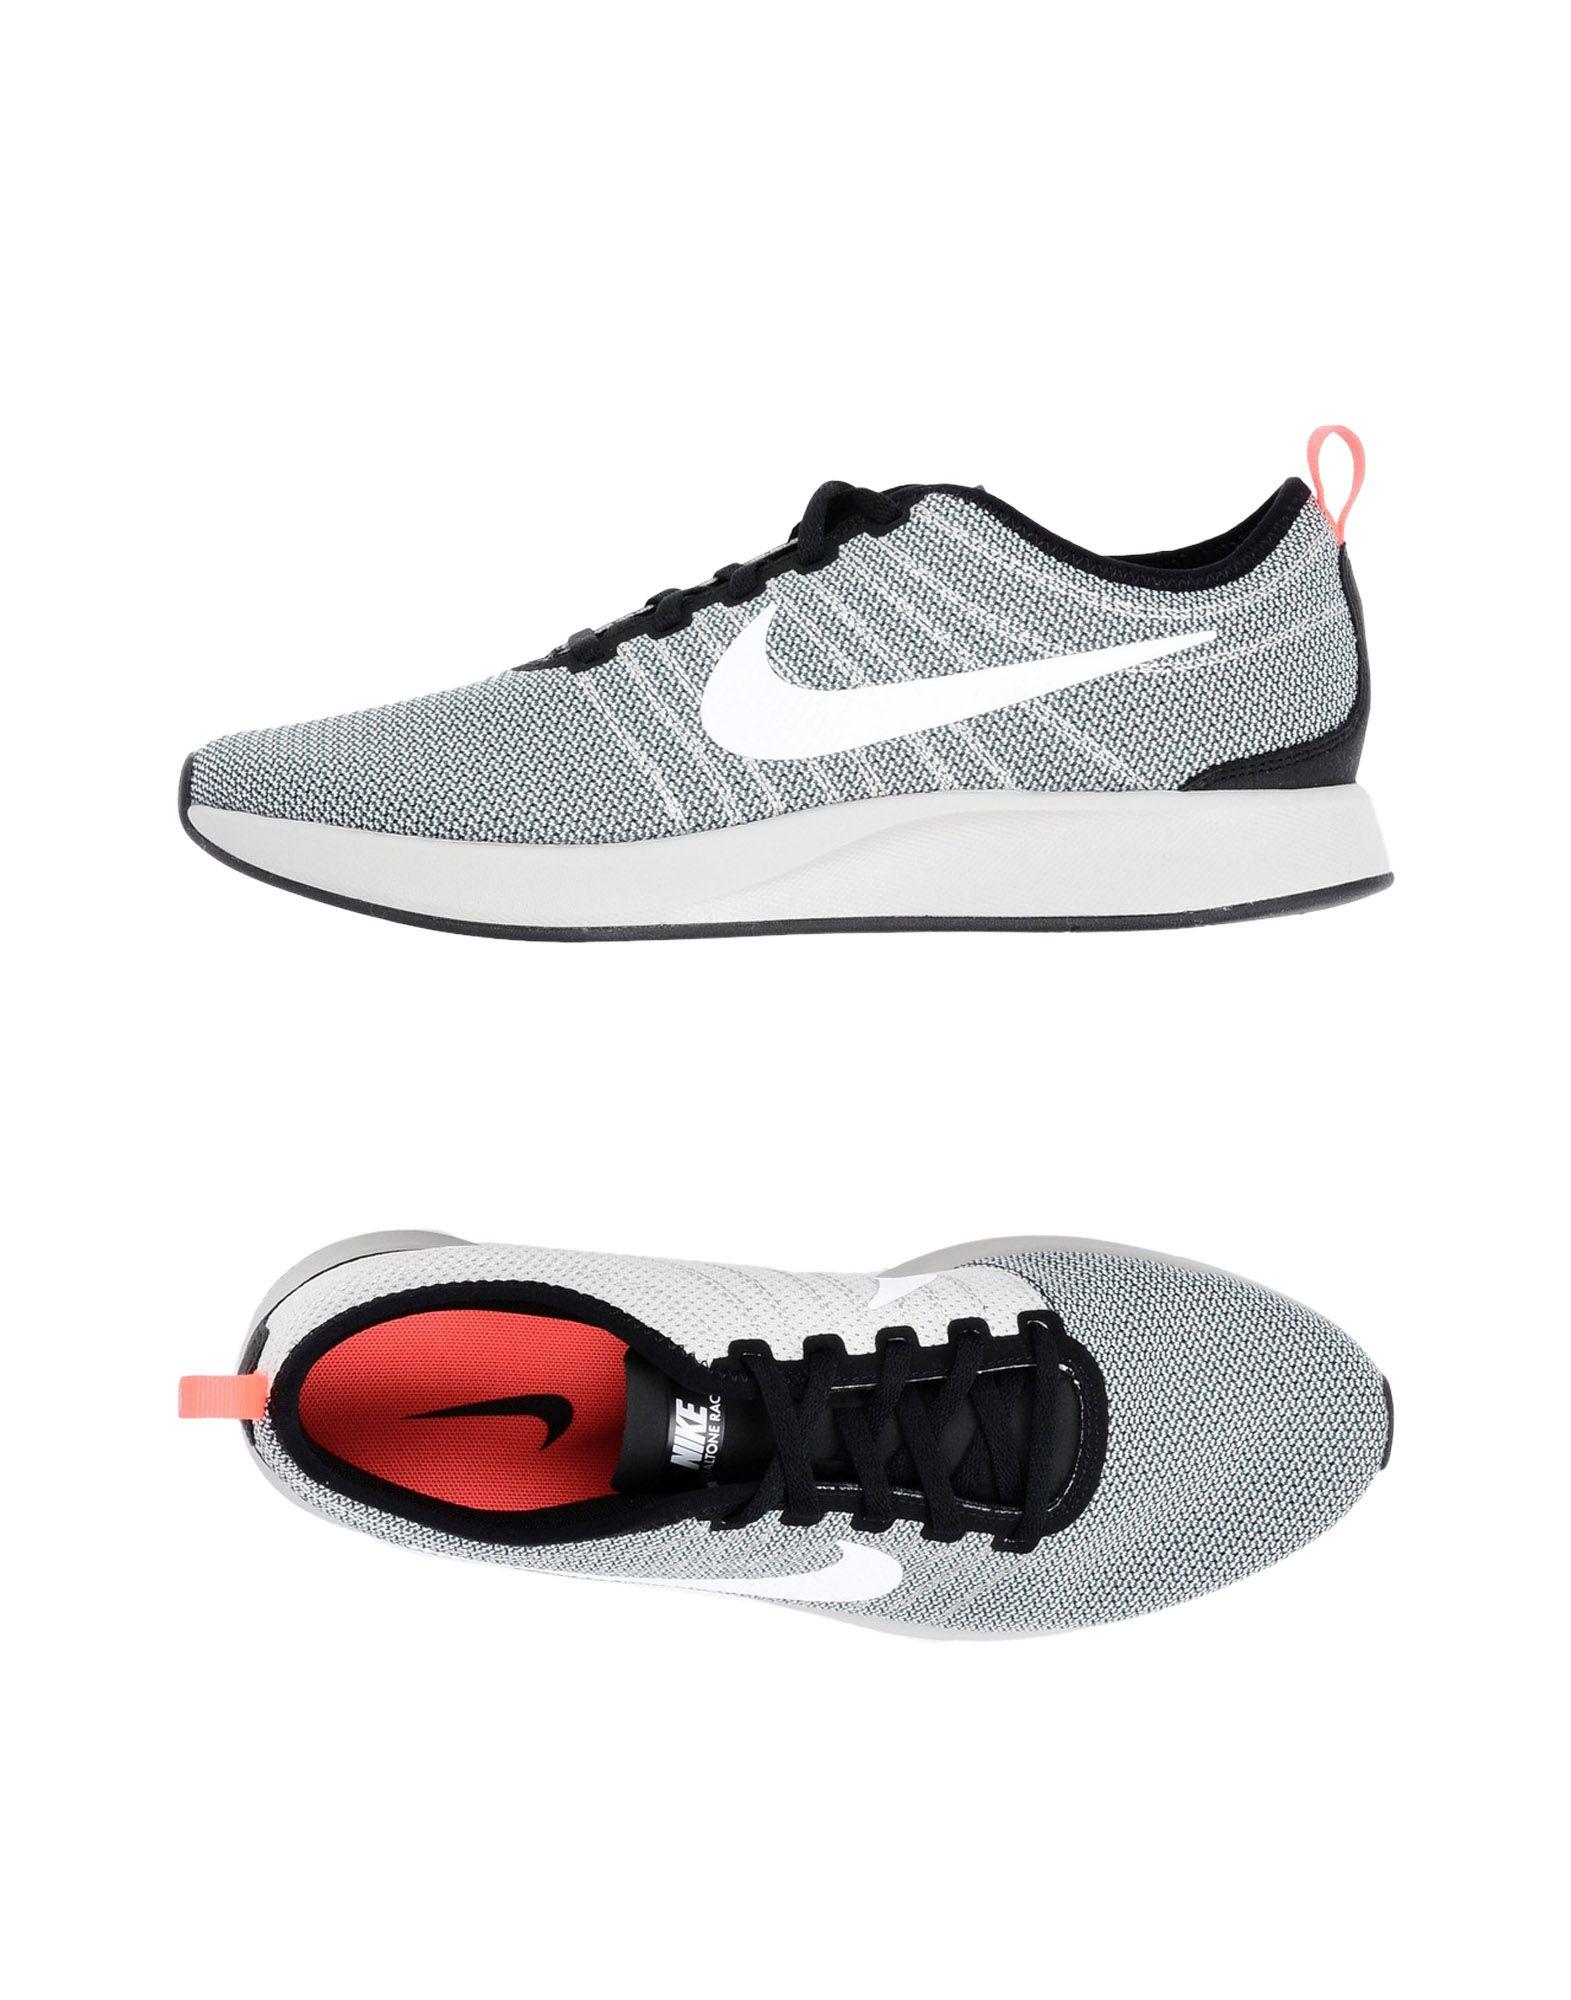 Sneakers Nike  Dualtone Racer - Uomo - 11325498JH